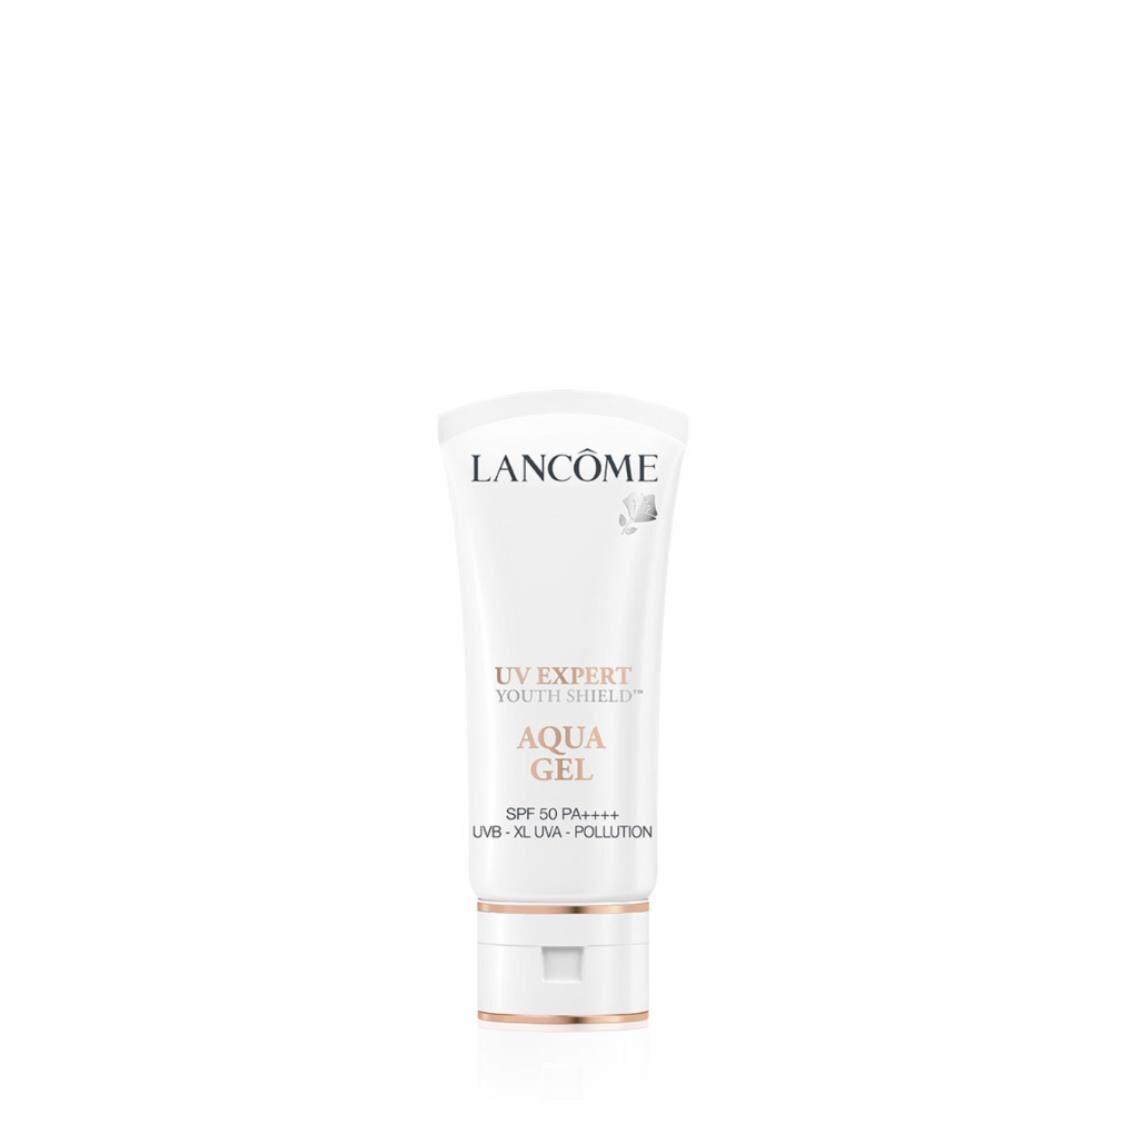 Lancome UV Expert Aqua Gel